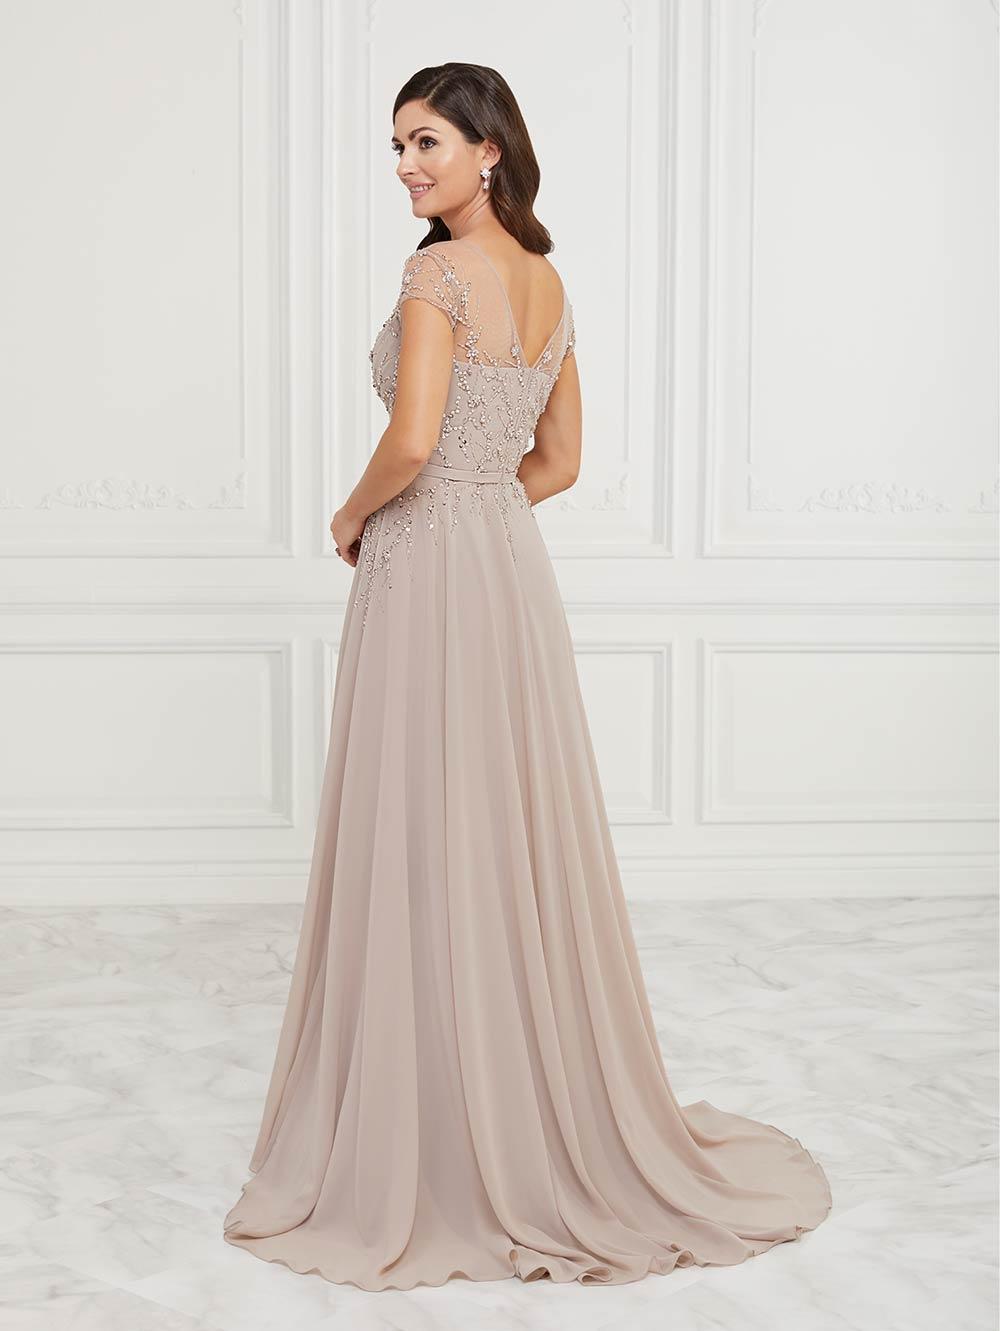 special-occasion-dresses-jacquelin-bridals-canada-27692